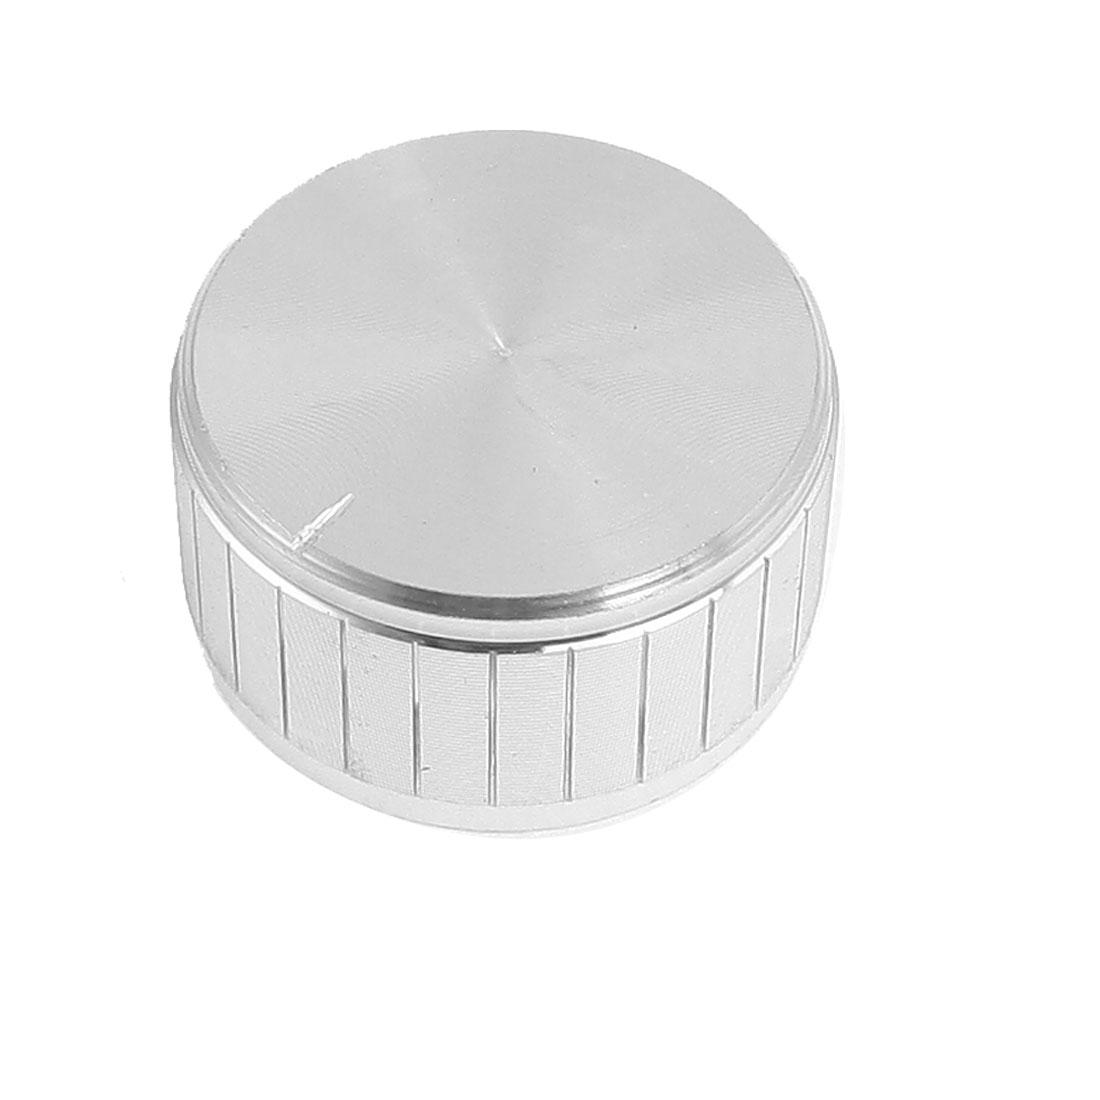 28mm x 15mm Potentiometer Control Volume Rotary Knob Cap Silver Tone